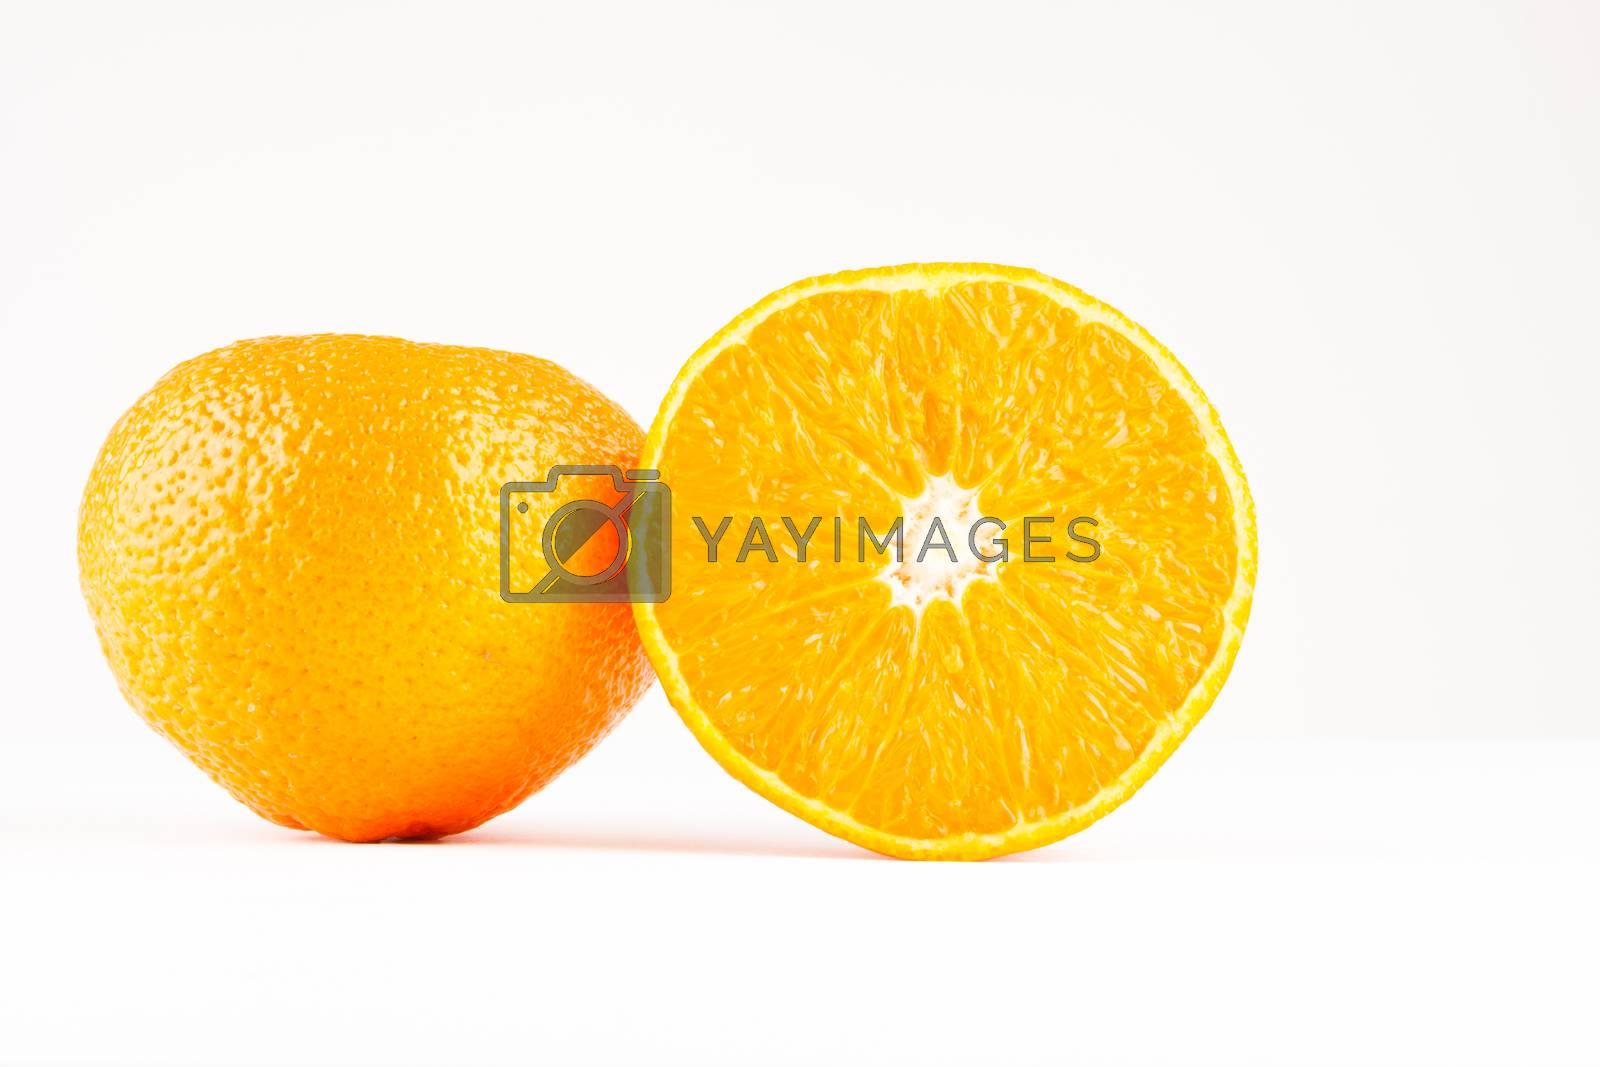 Royalty free image of mandarin by furo_felix